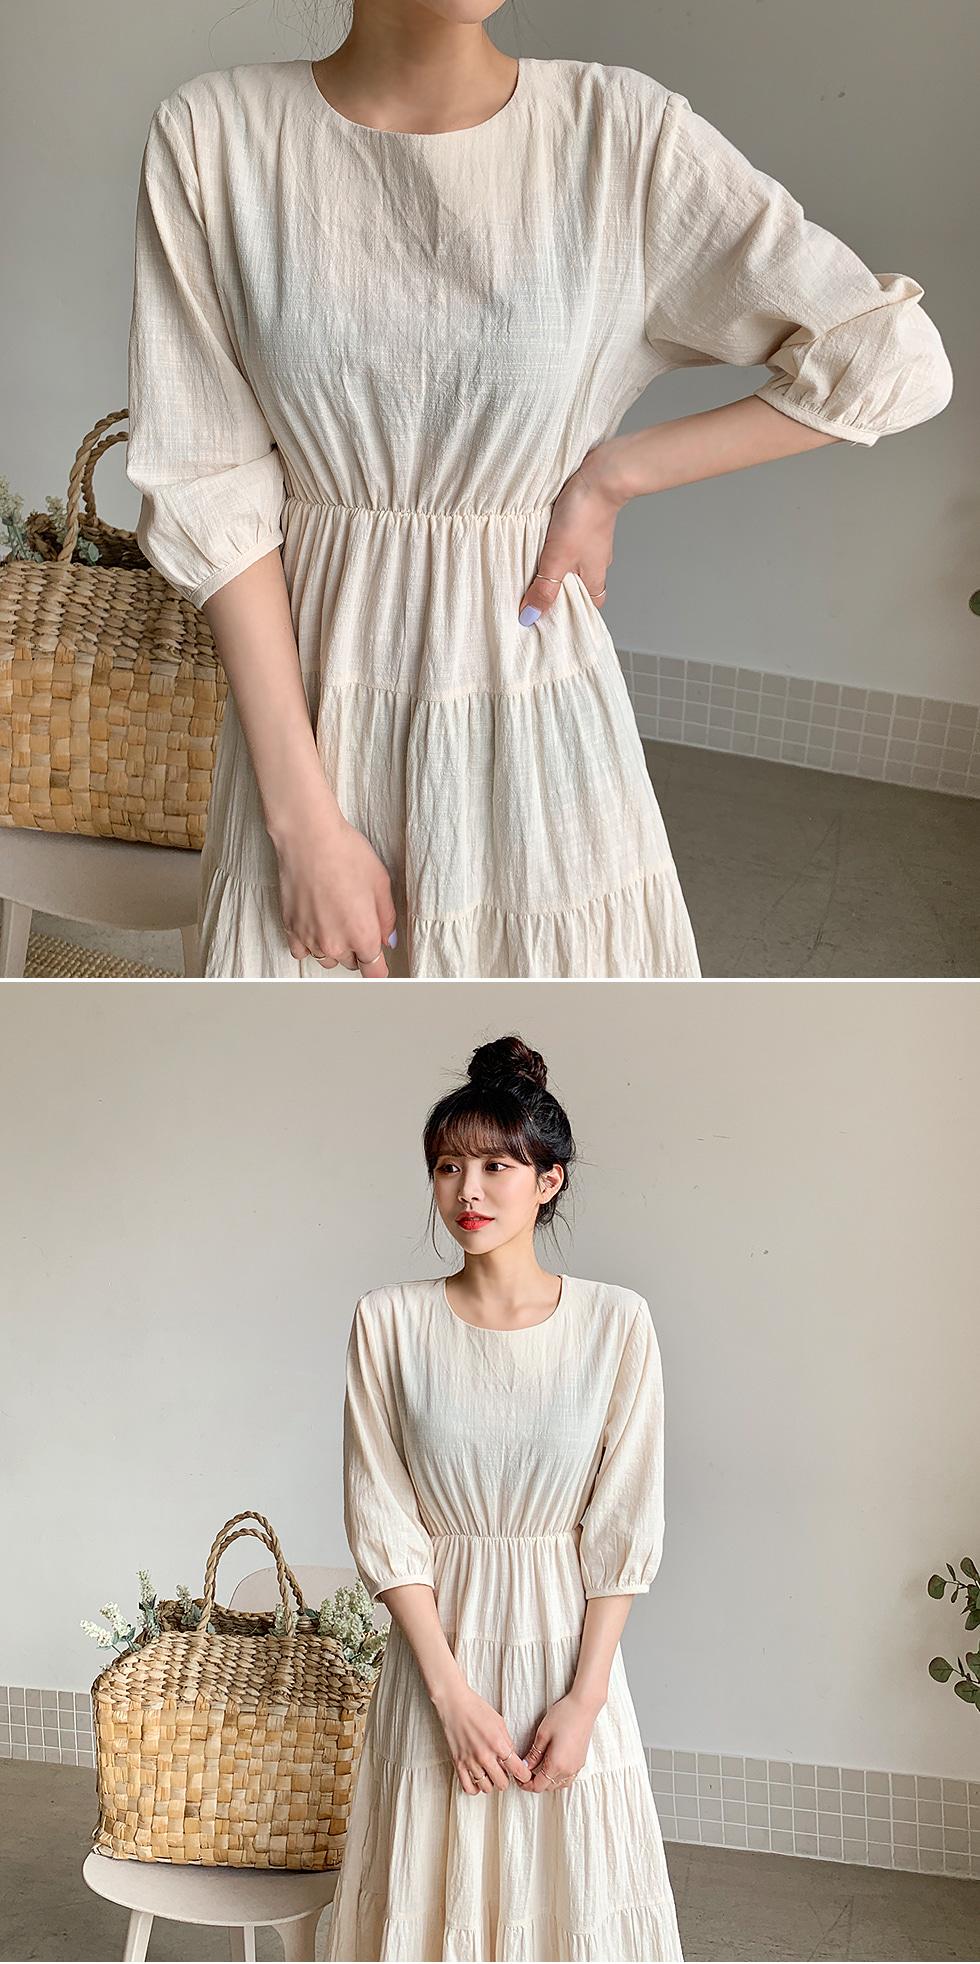 Woodcancan Dress